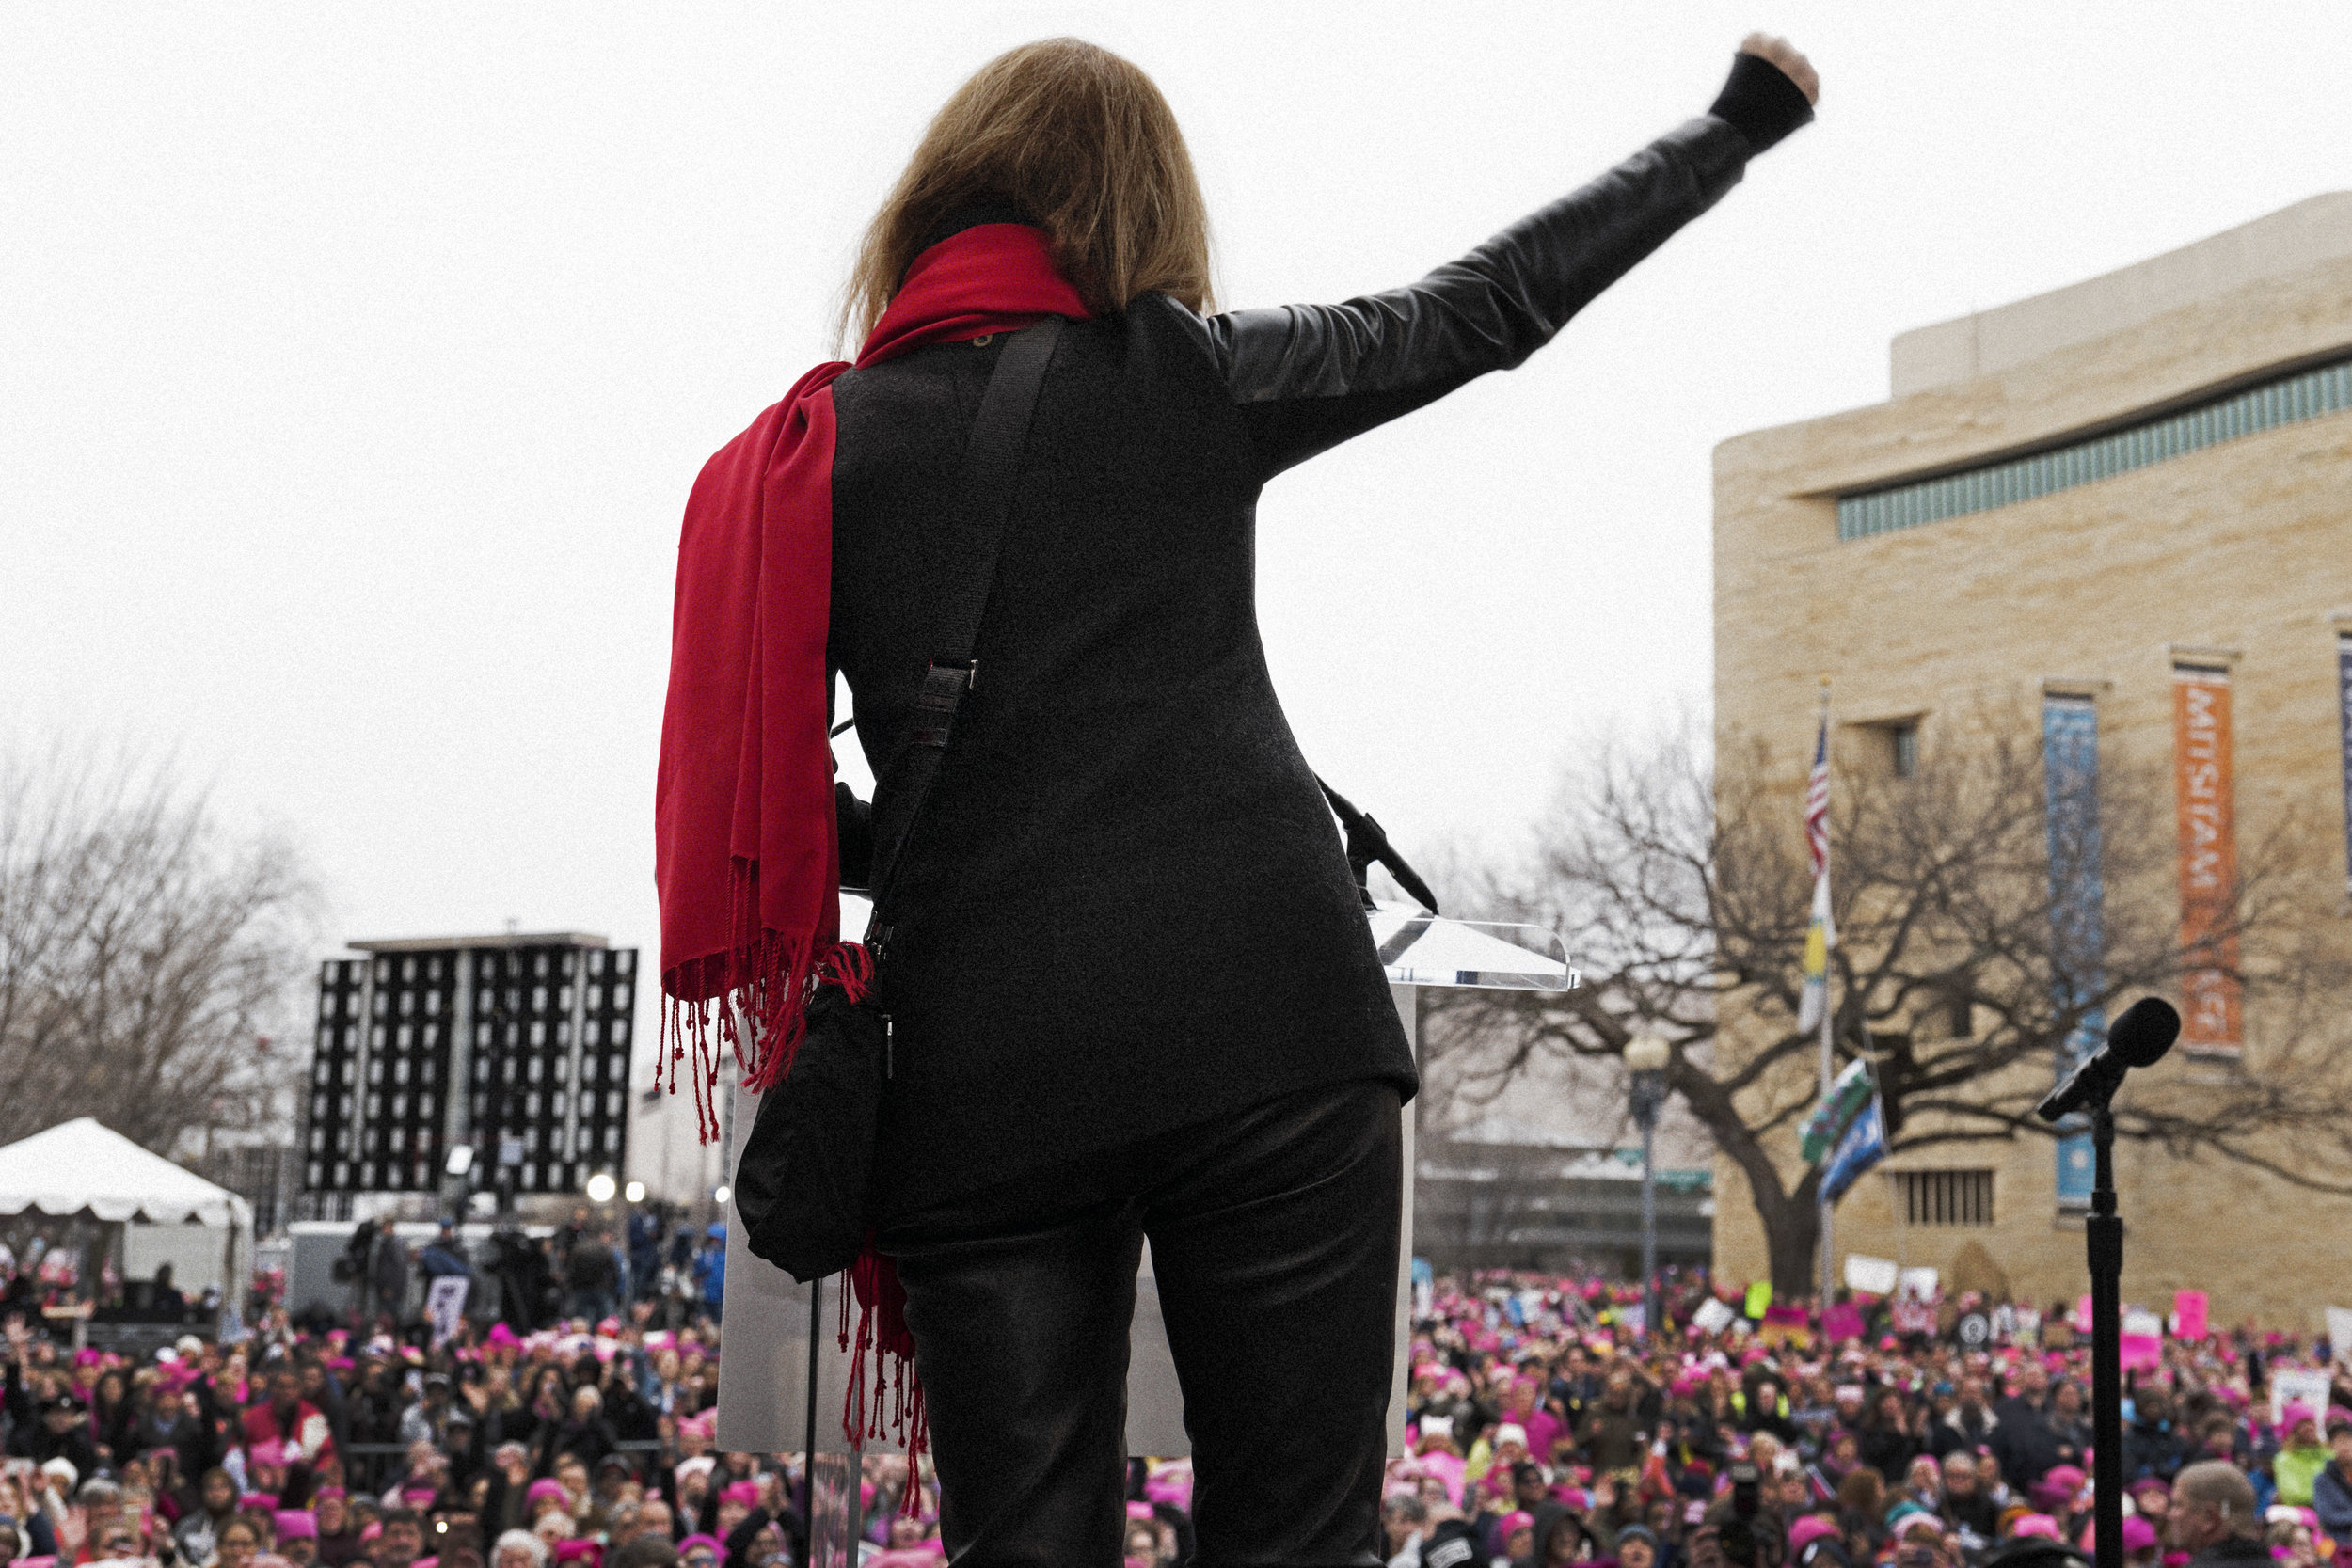 Gloria Steinem on stage at the Women's March on Washington, Jan. 21, 2017.Photo Credit: Cass Bird